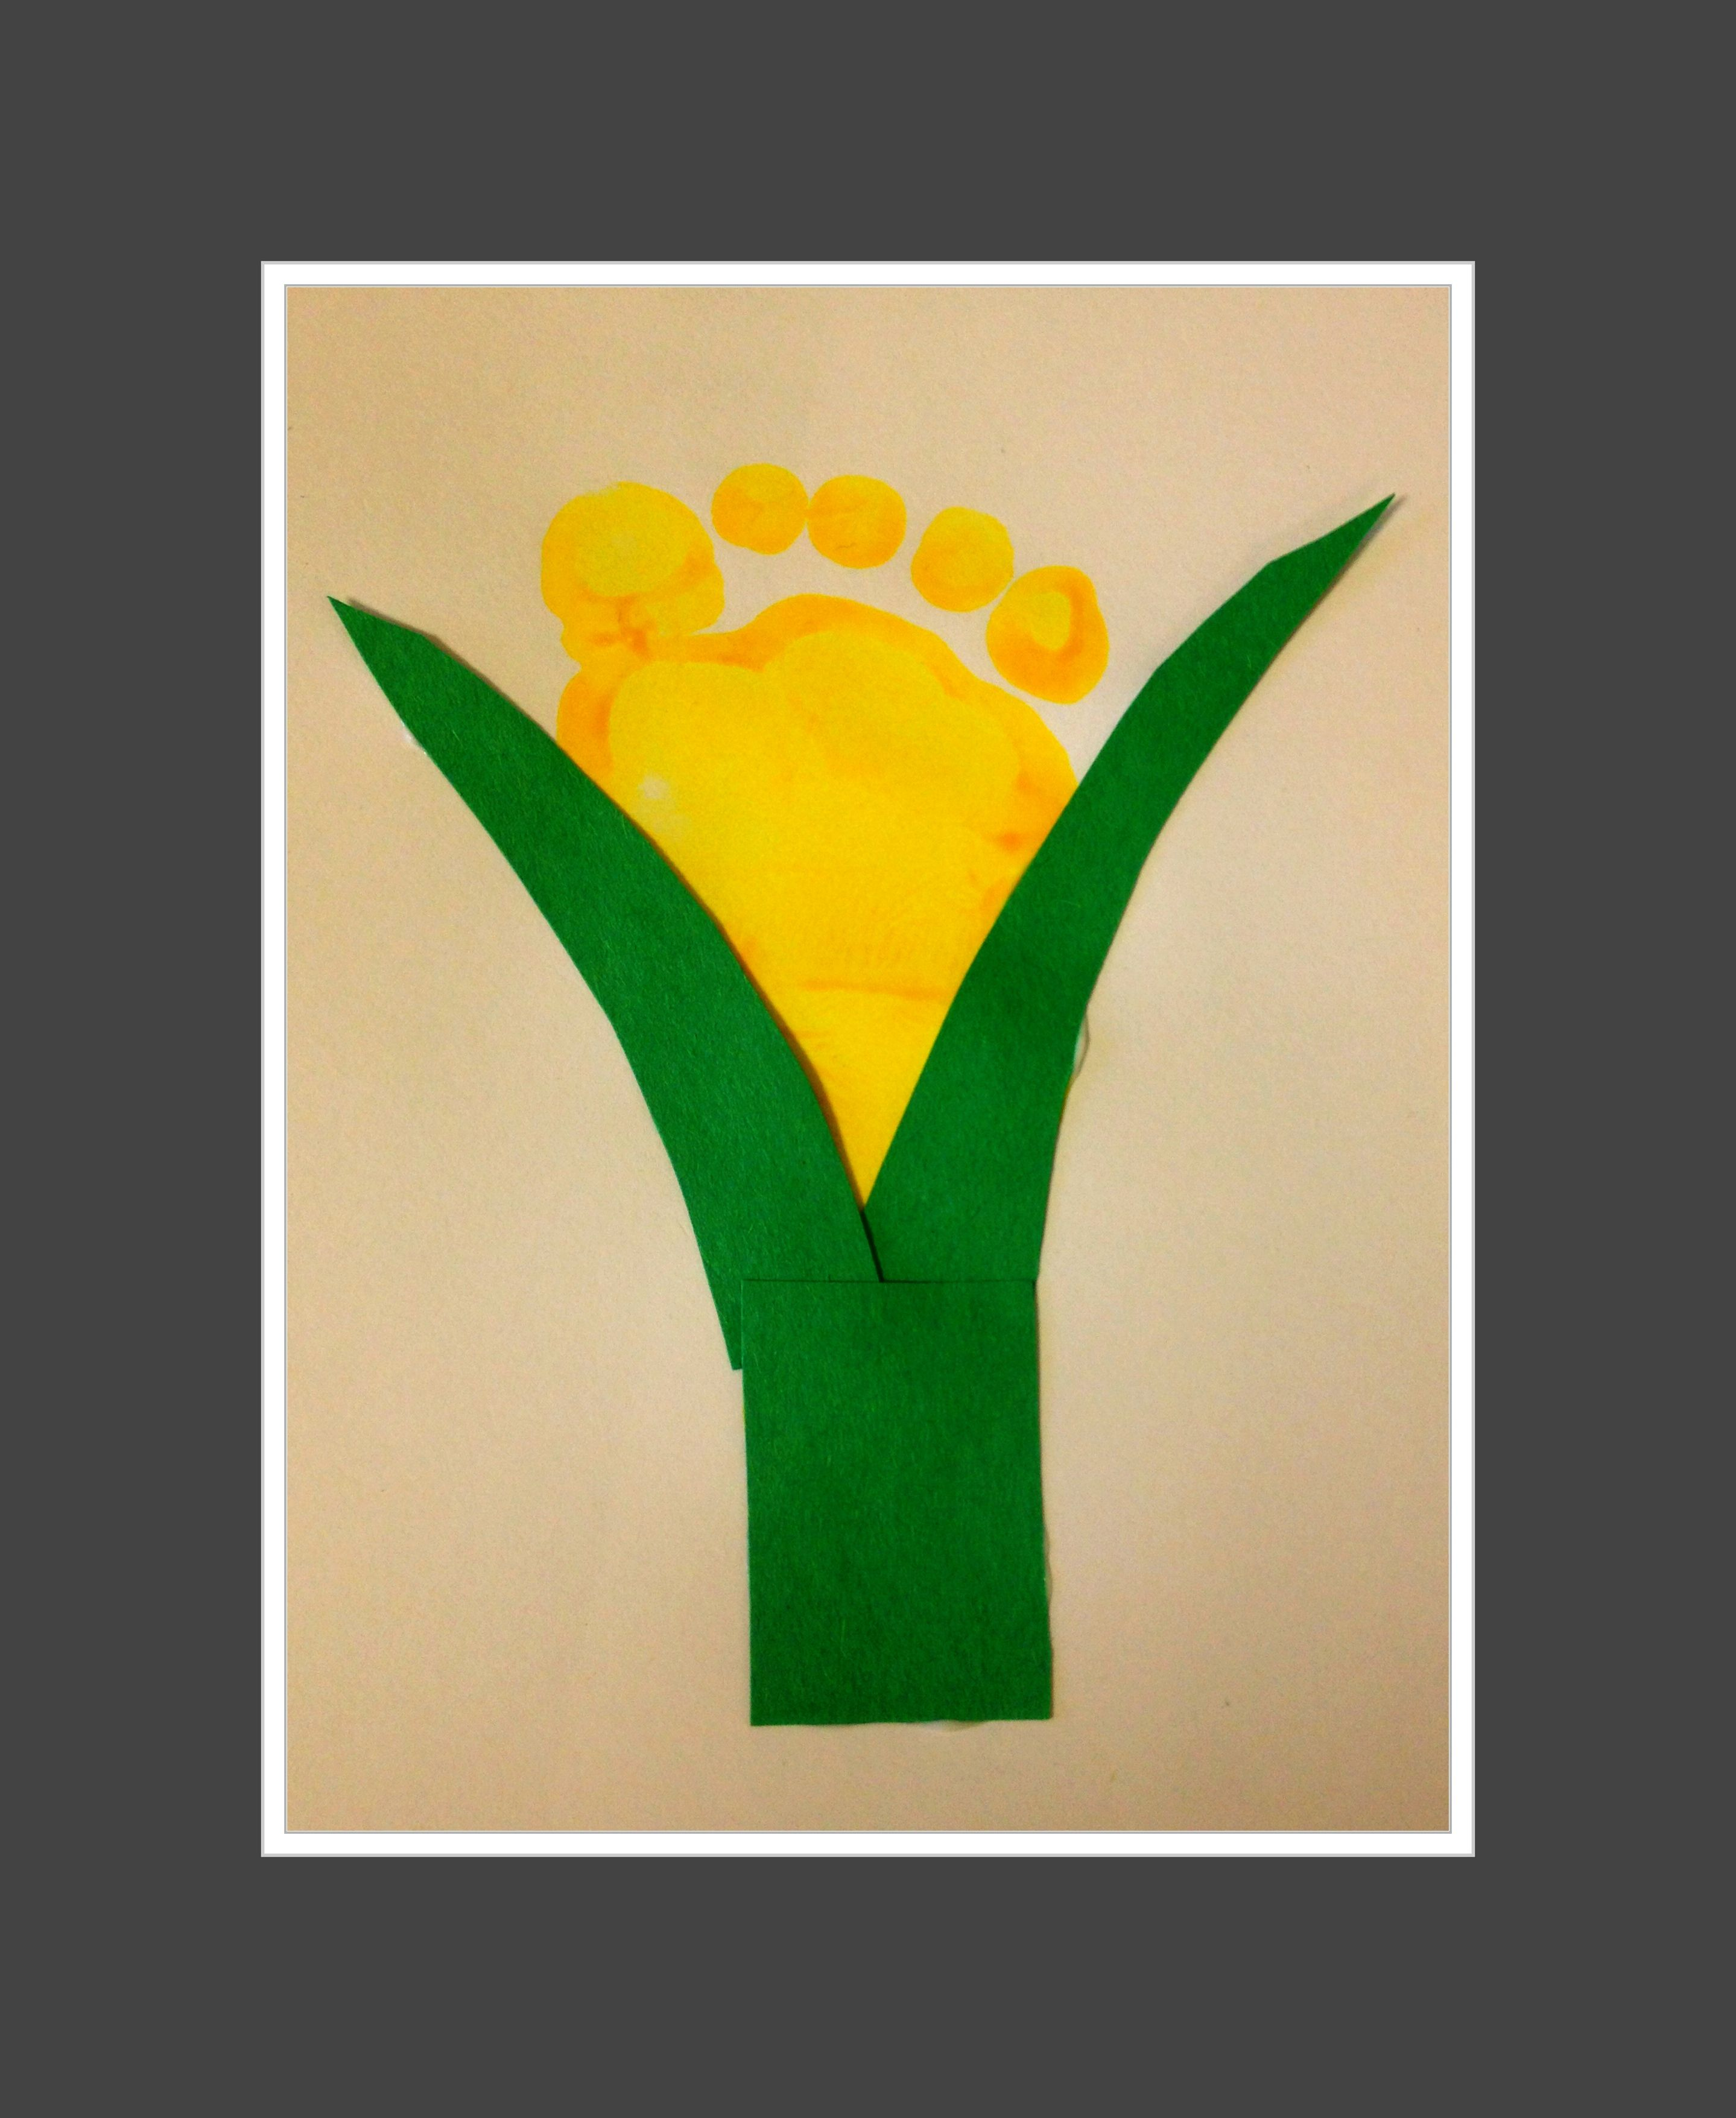 Baby corn footprint | Footprint Art | Pinterest | Footprints ...